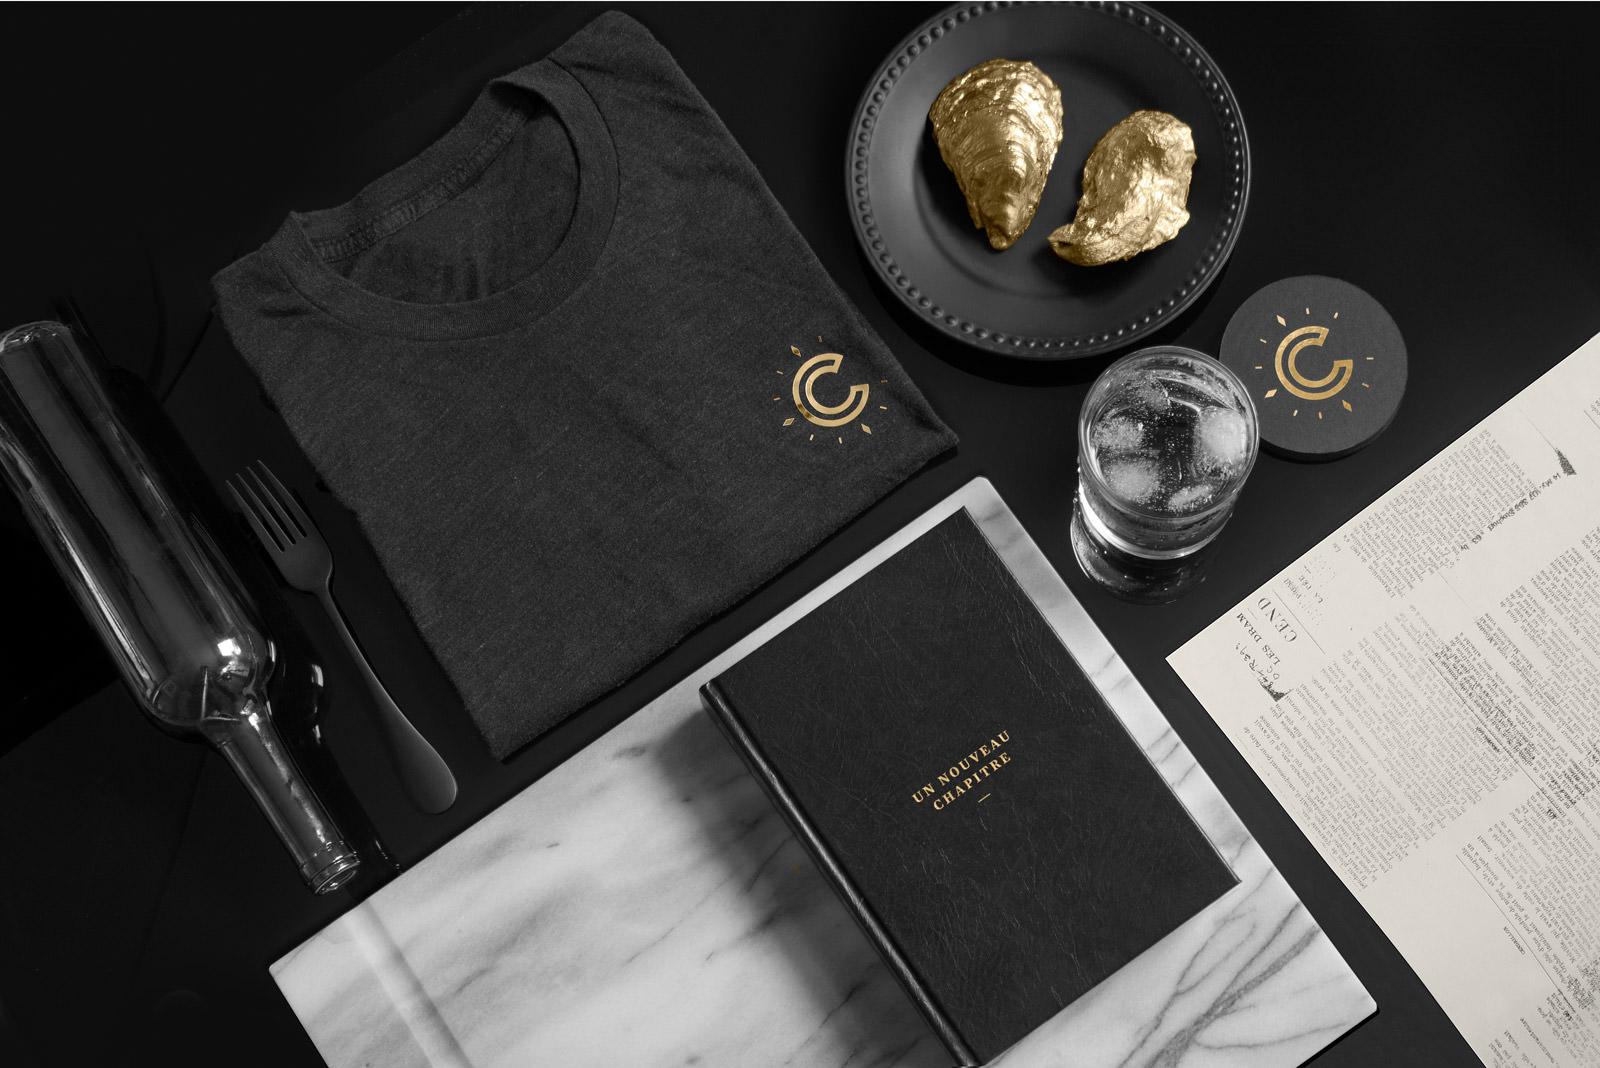 Figure-Jeremy-Hall-Design-Graphique-Logo-Branding-Image-De-Marque-Cendrillon-Restaurant-4.jpg